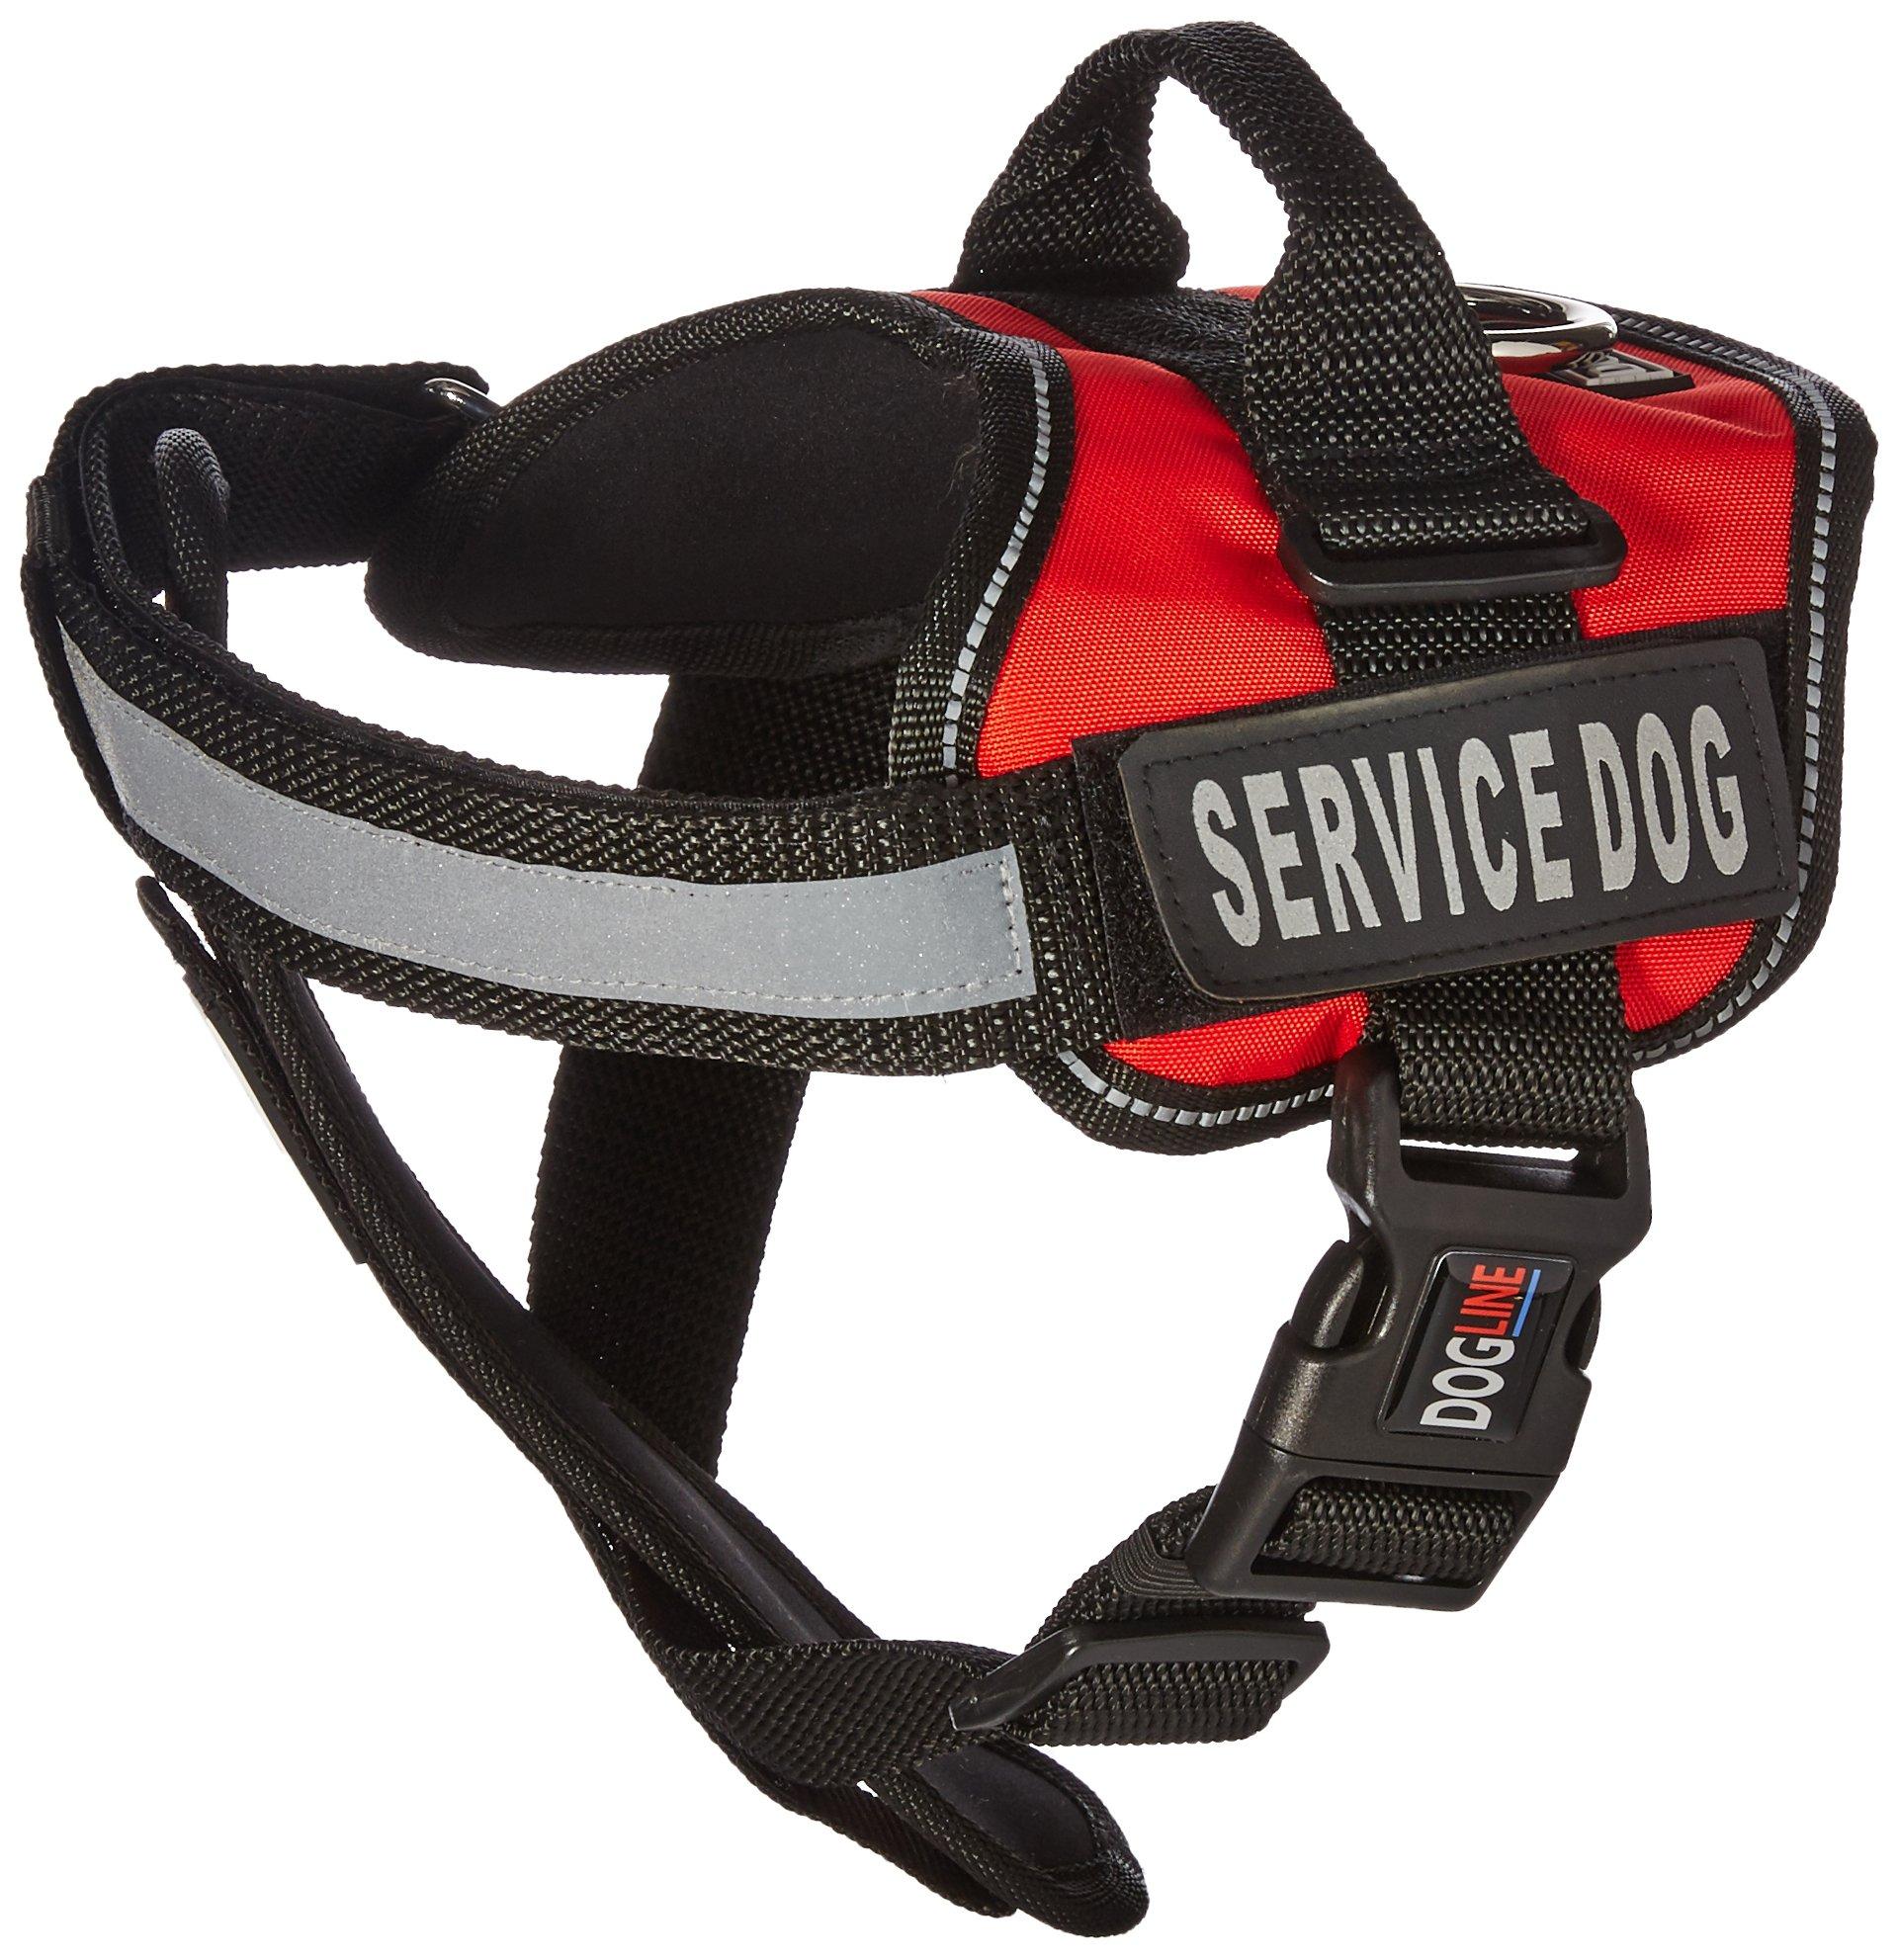 Dogline Unimax Service Dog Vest and Free Service Dog ID Badge with ADA Law, Medium, Red